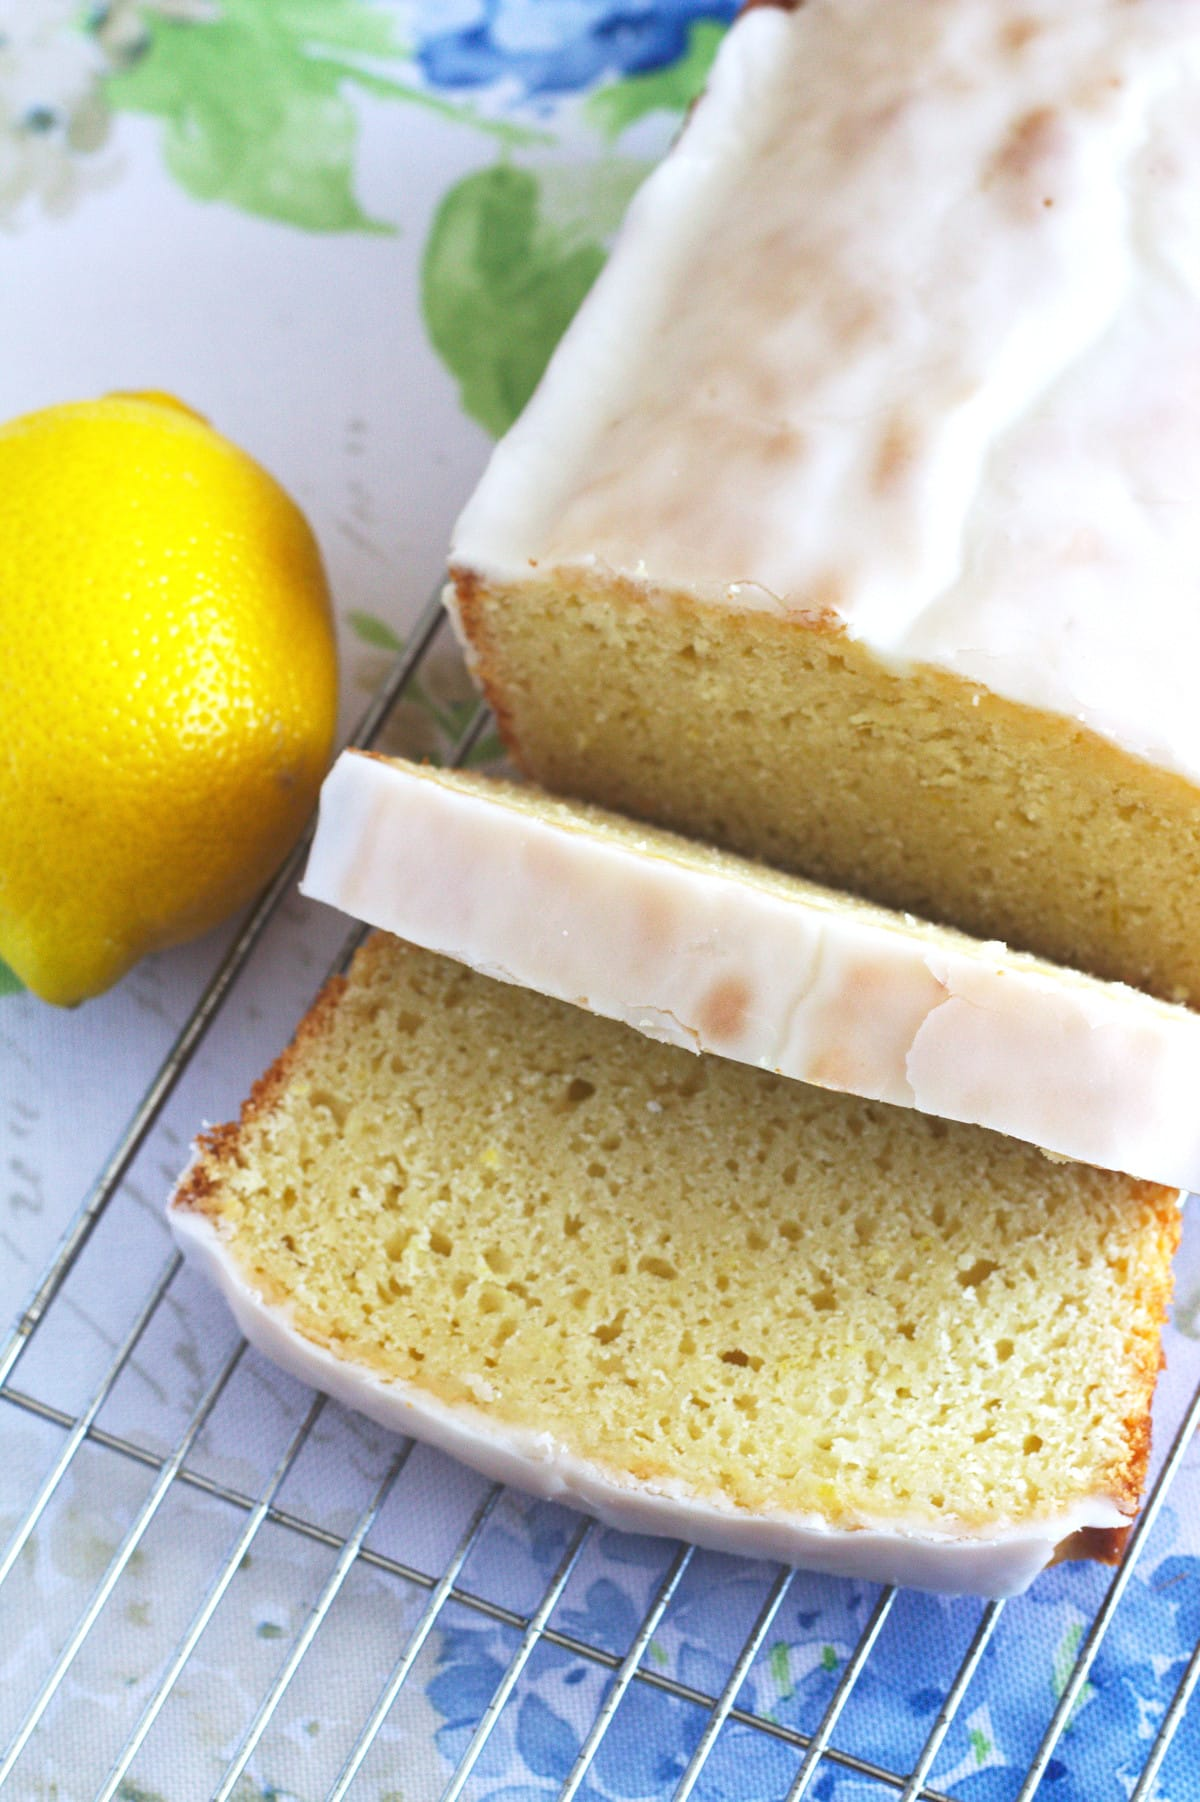 Slices cut out of a lemon loaf.